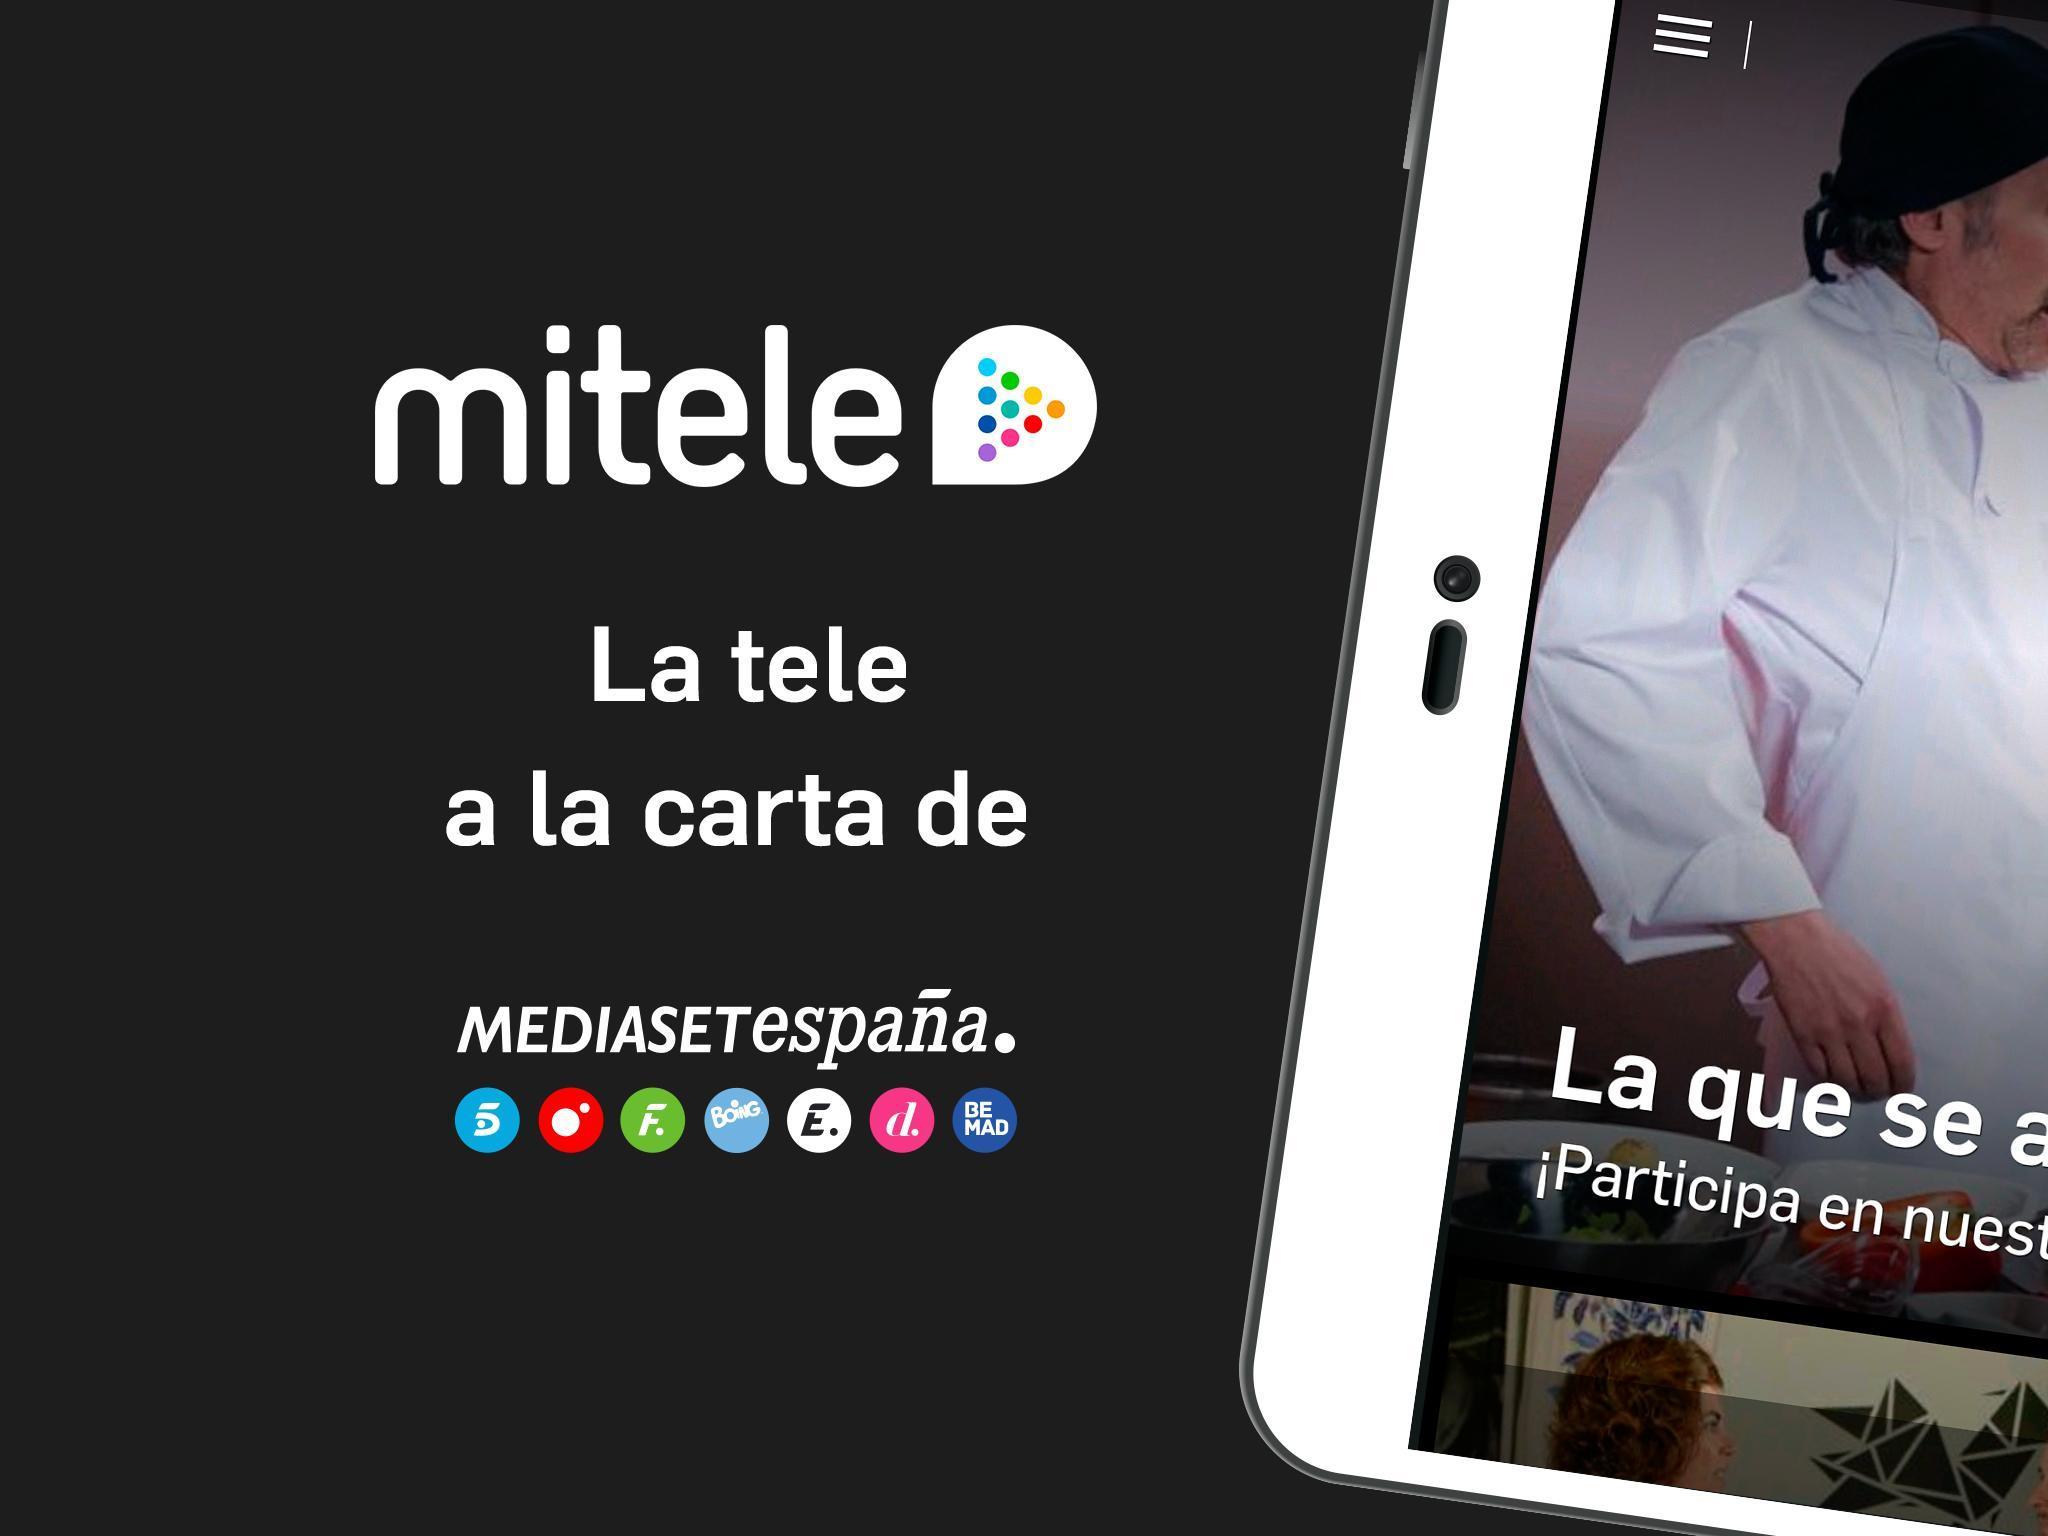 Mitele - Mediaset Spain VOD TV for Android - APK Download